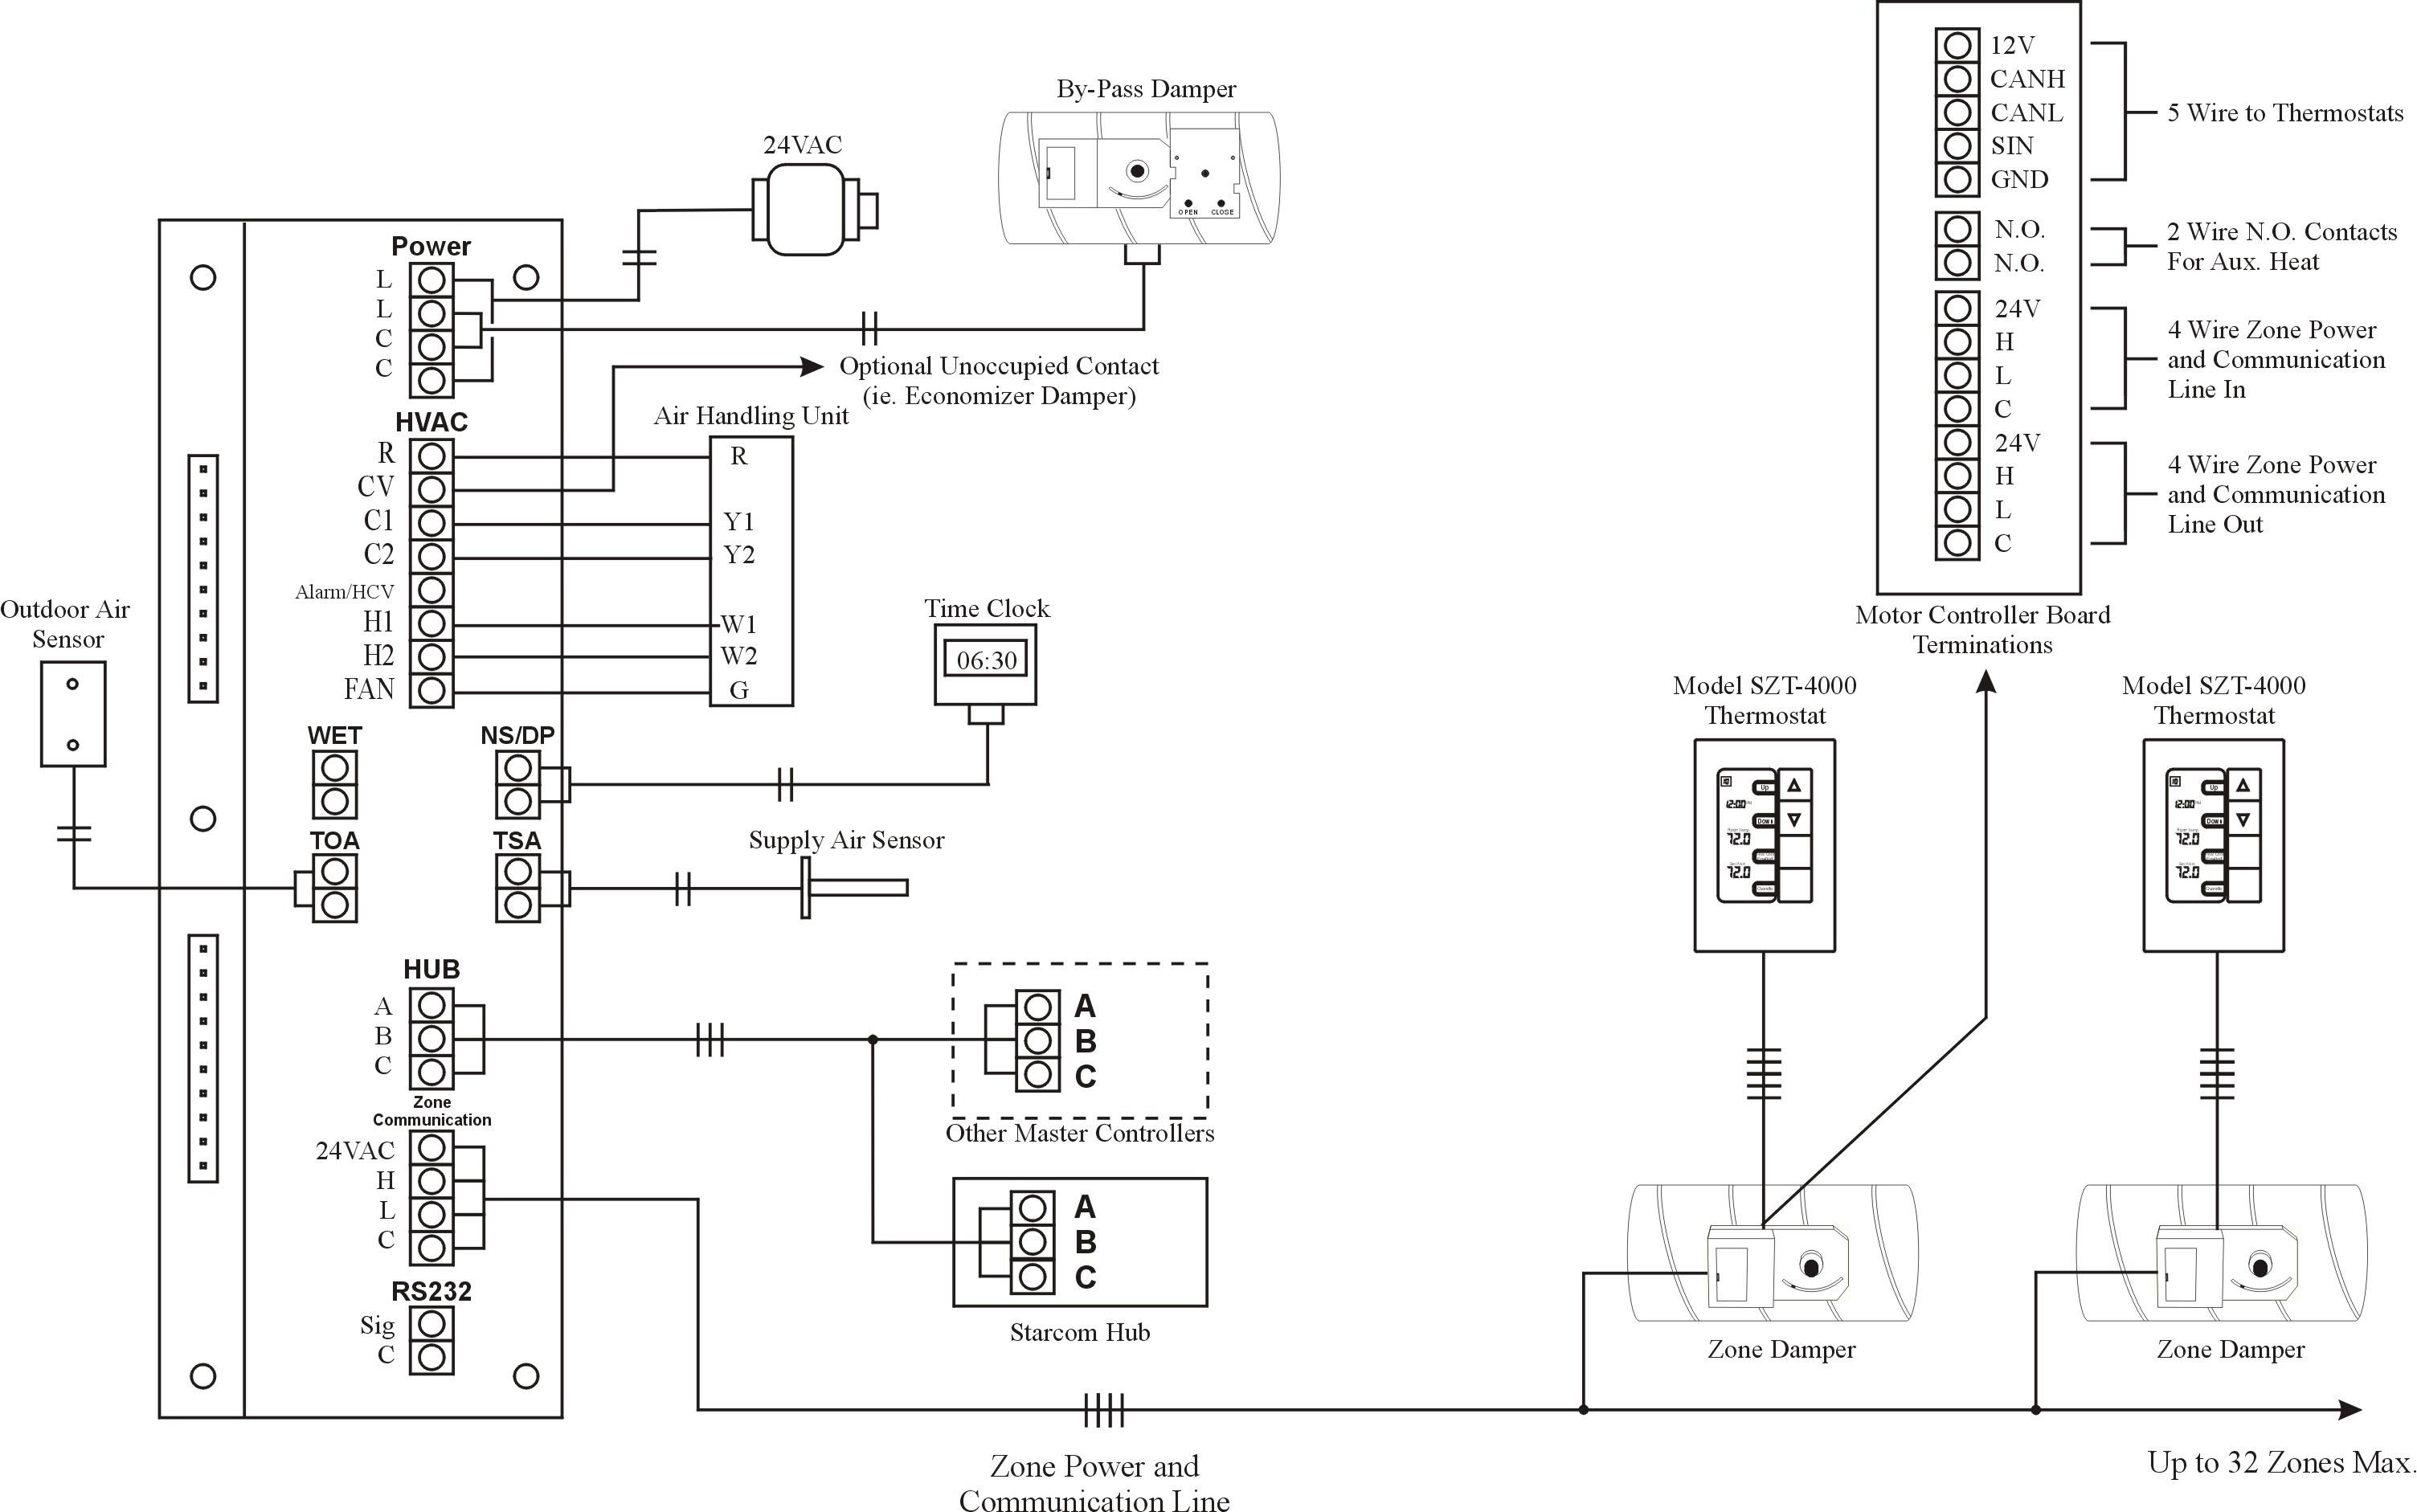 Viper 5706 Wiring Diagram Wiring Diagrams Of Viper 5706 Wiring Diagram